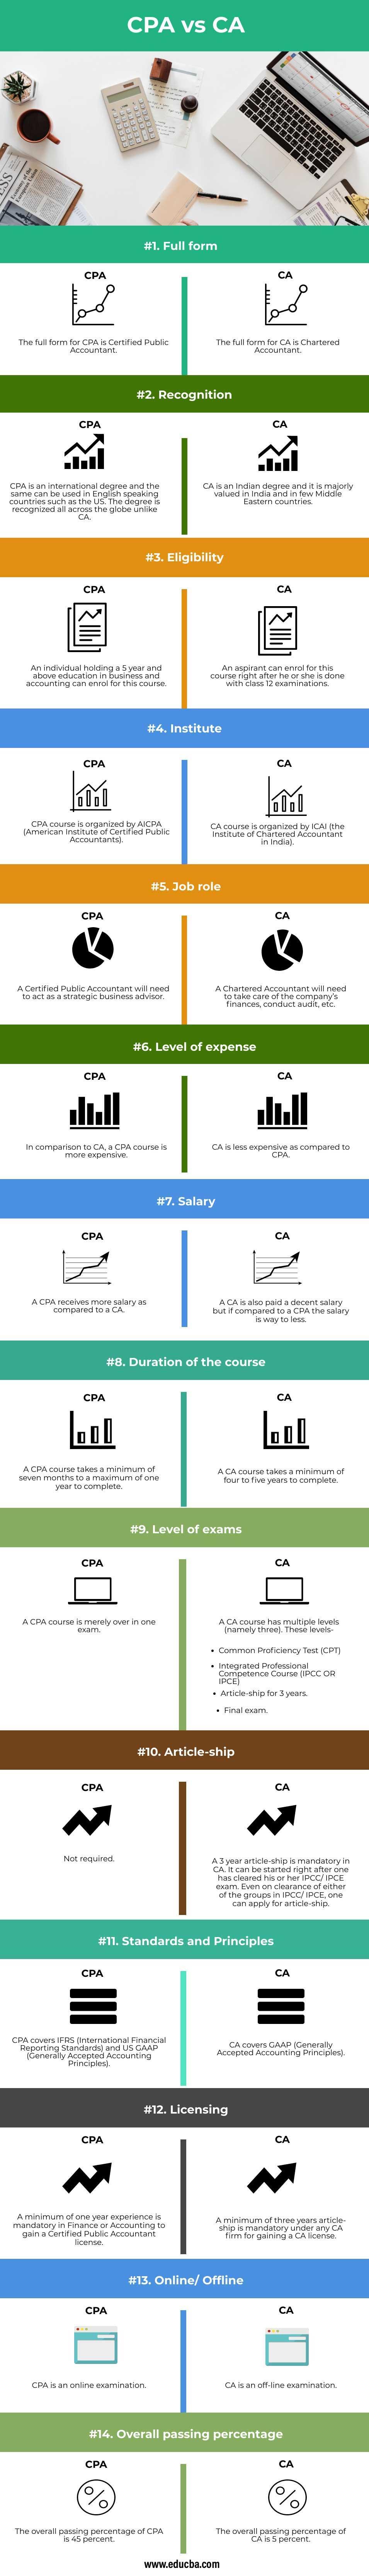 CPA-vs-CA-info